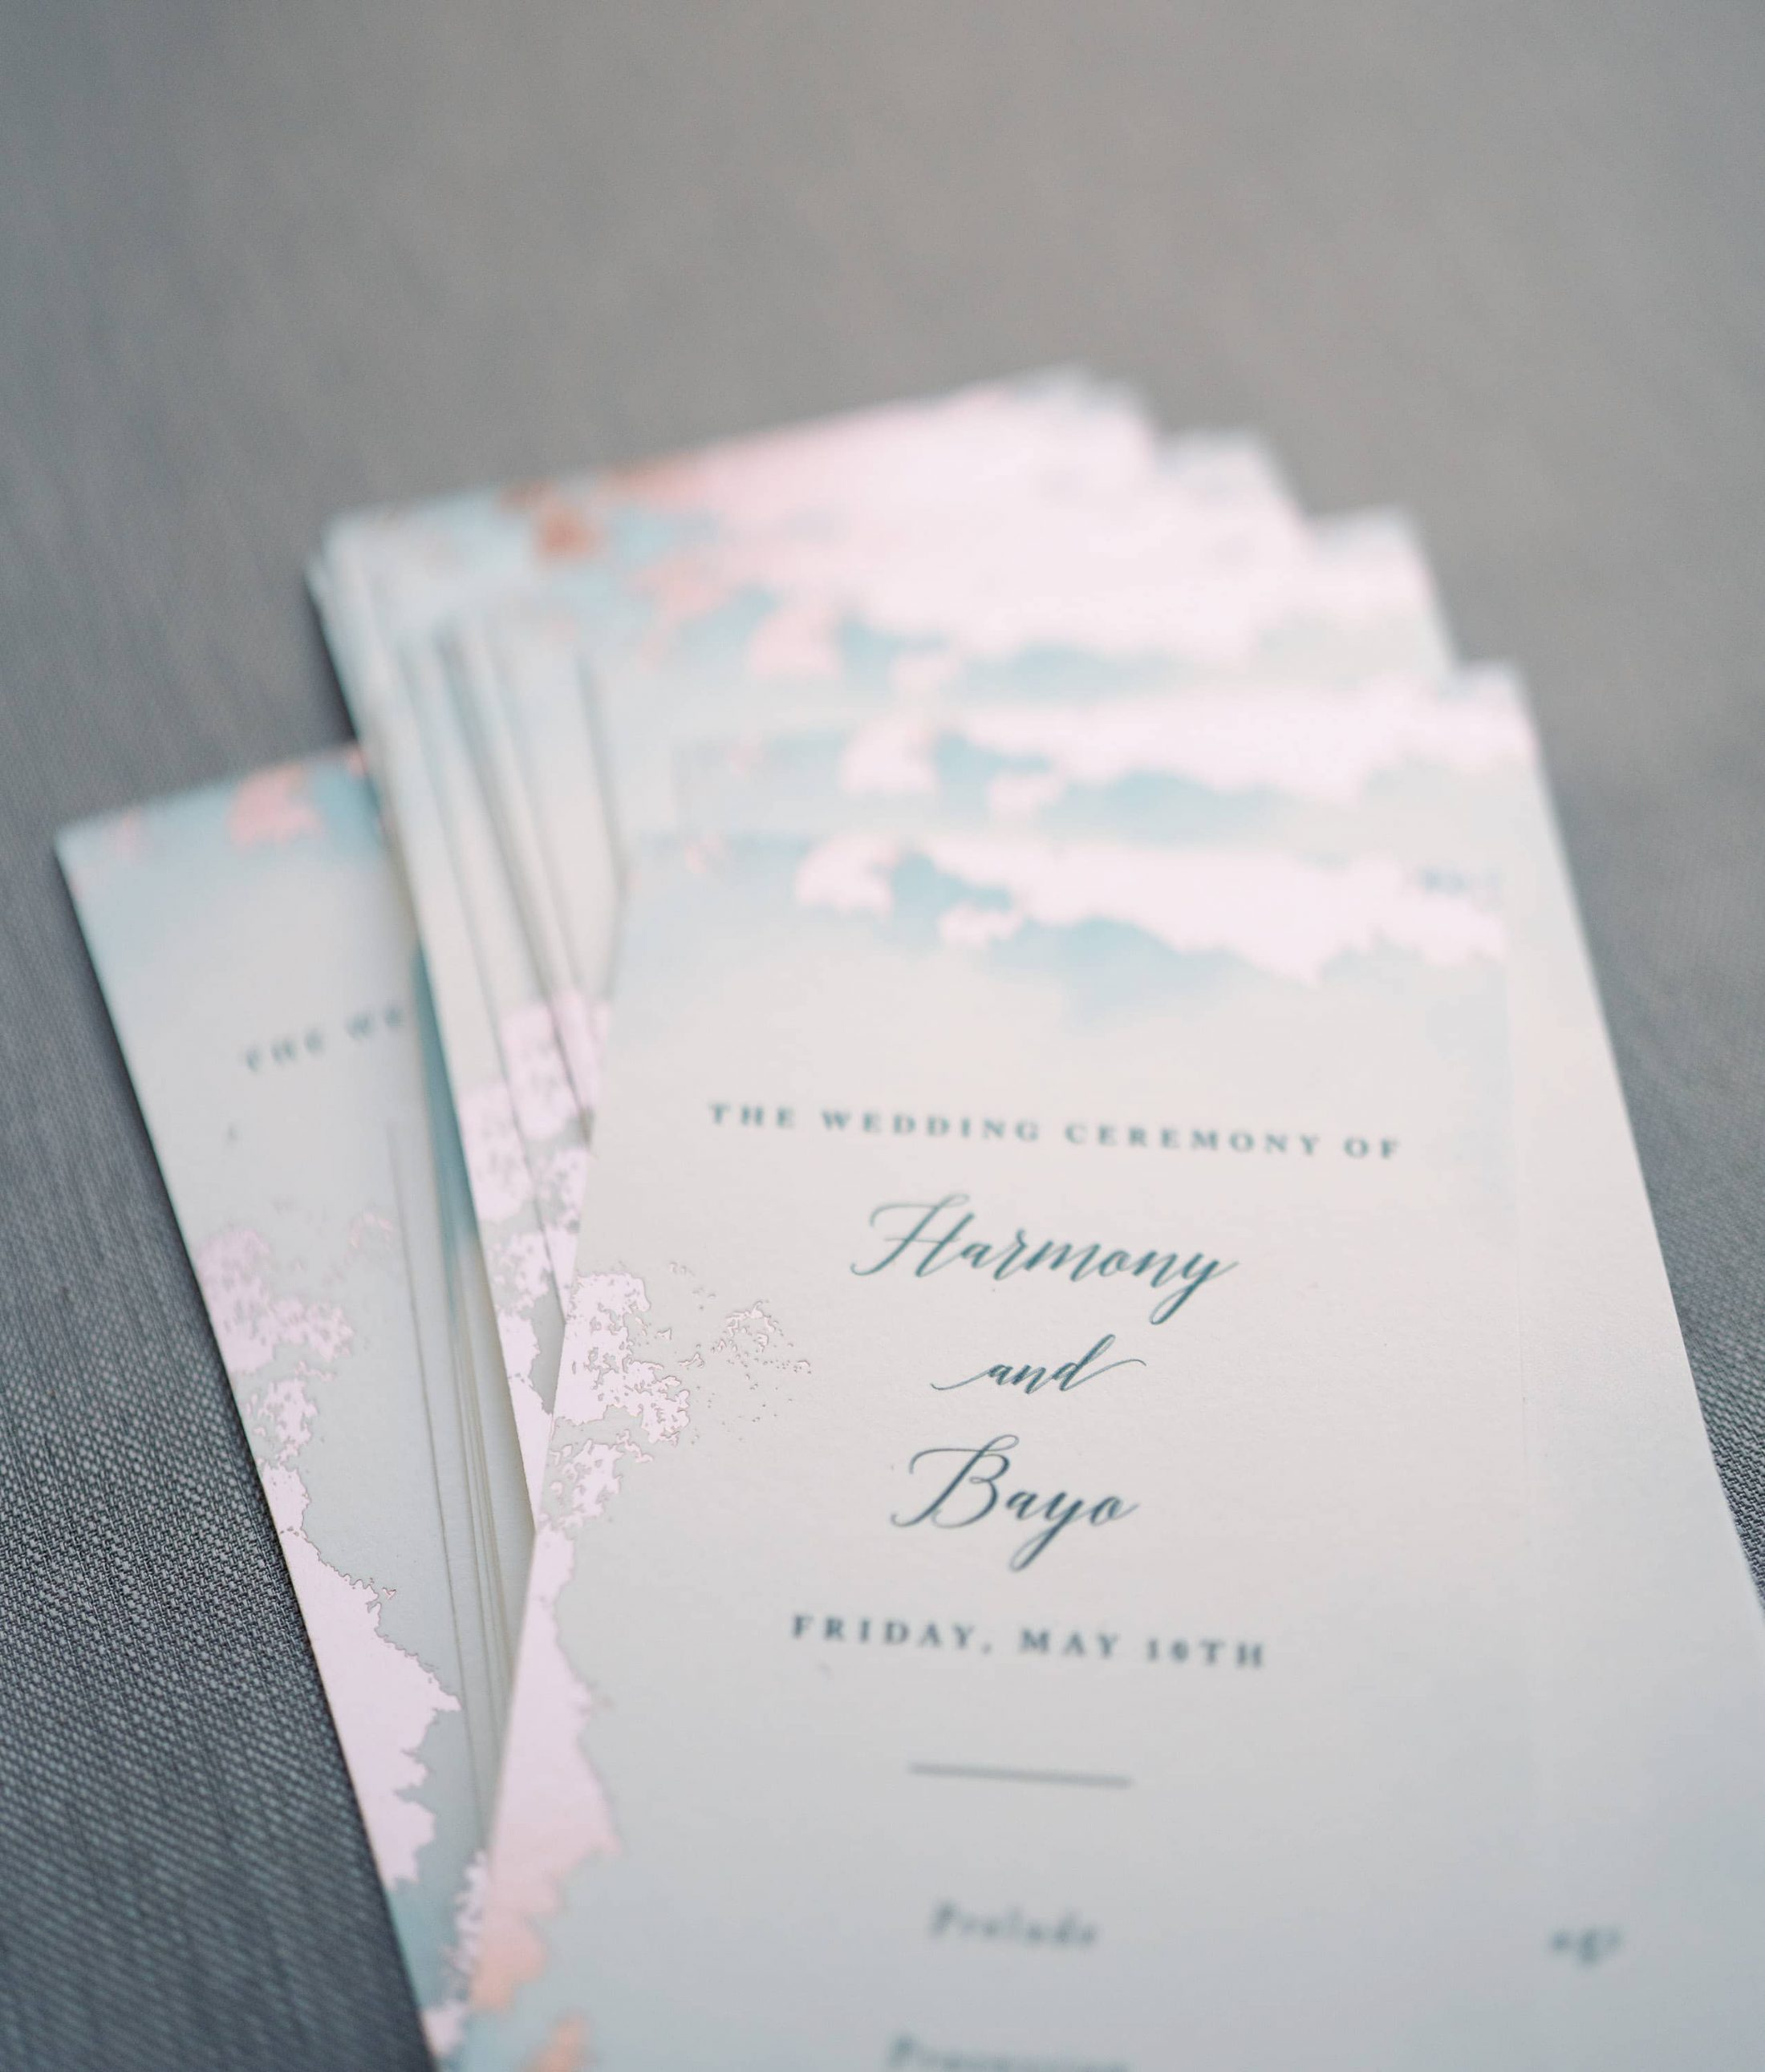 Wedding invitations at Maui wedding at Four Seasons Resort Maui in Wailea, Hawaii | Photo by James x Schulze